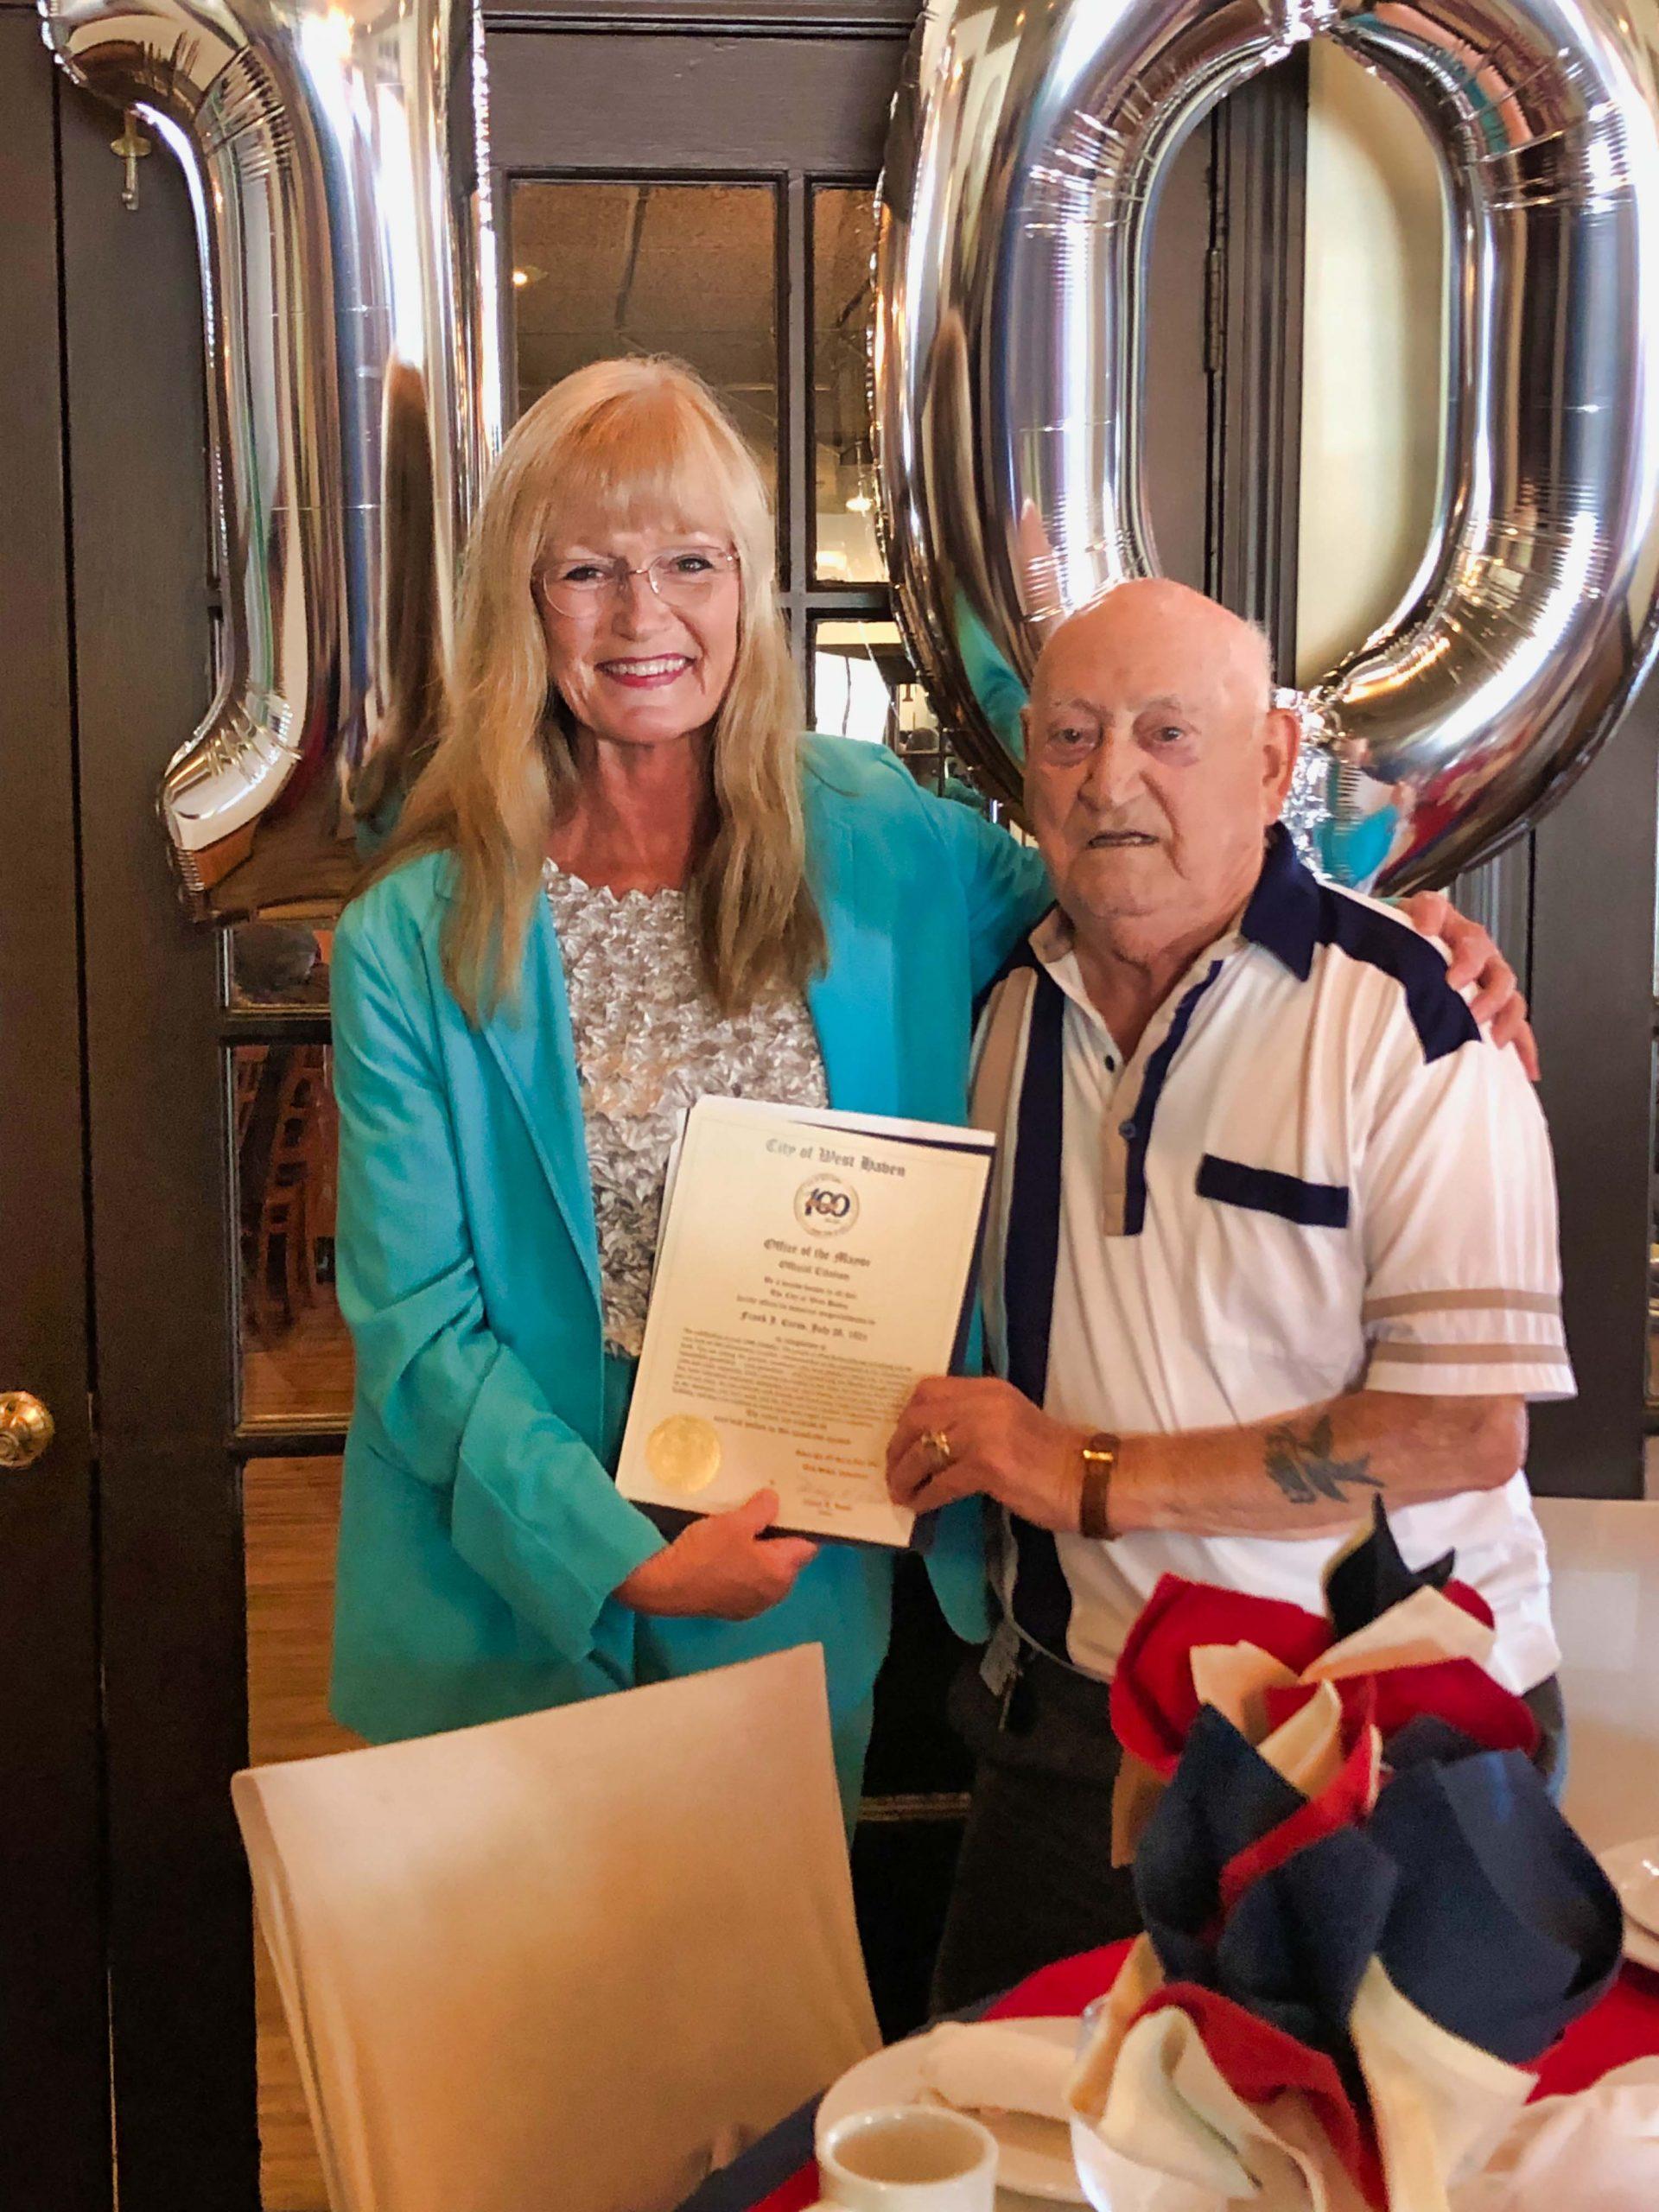 Corso marks 100th birthday